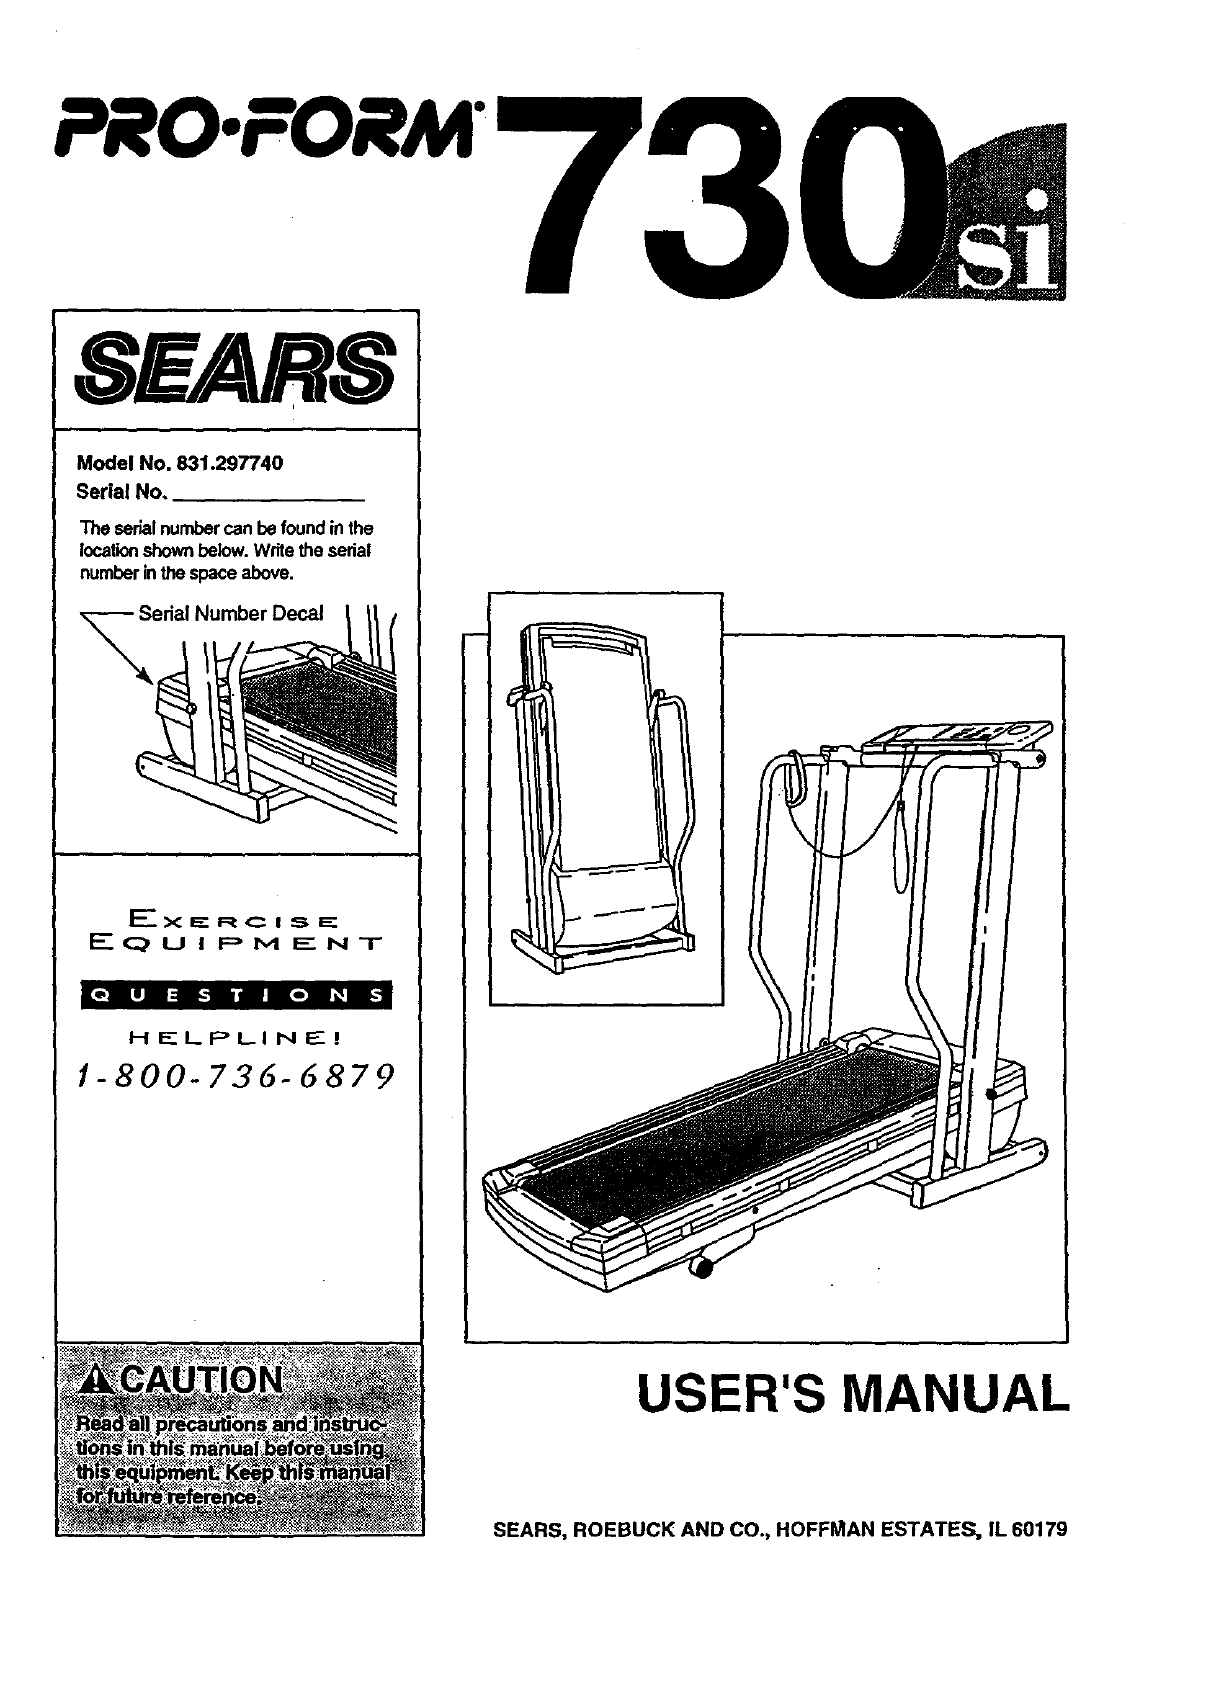 Proform 831297740 User Manual SPACE SAVER 730SI TREADMILL Manuals